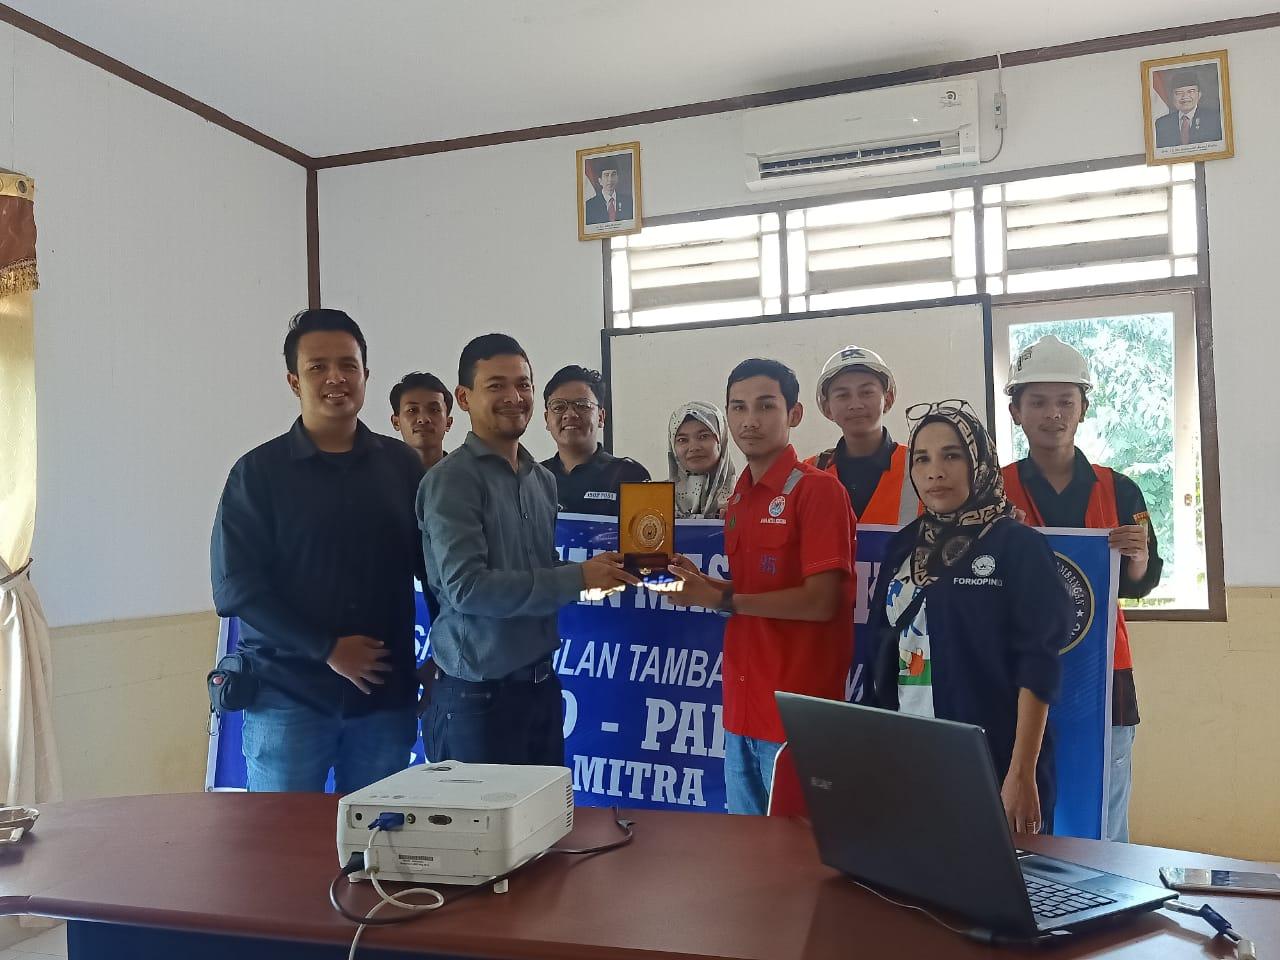 Kunjungan Industri Mahasiswa Prodi Teknik Pertambangan Ke CV. Bara Mitra Kencana Kecamatan Talawi Kota Sawahlunto